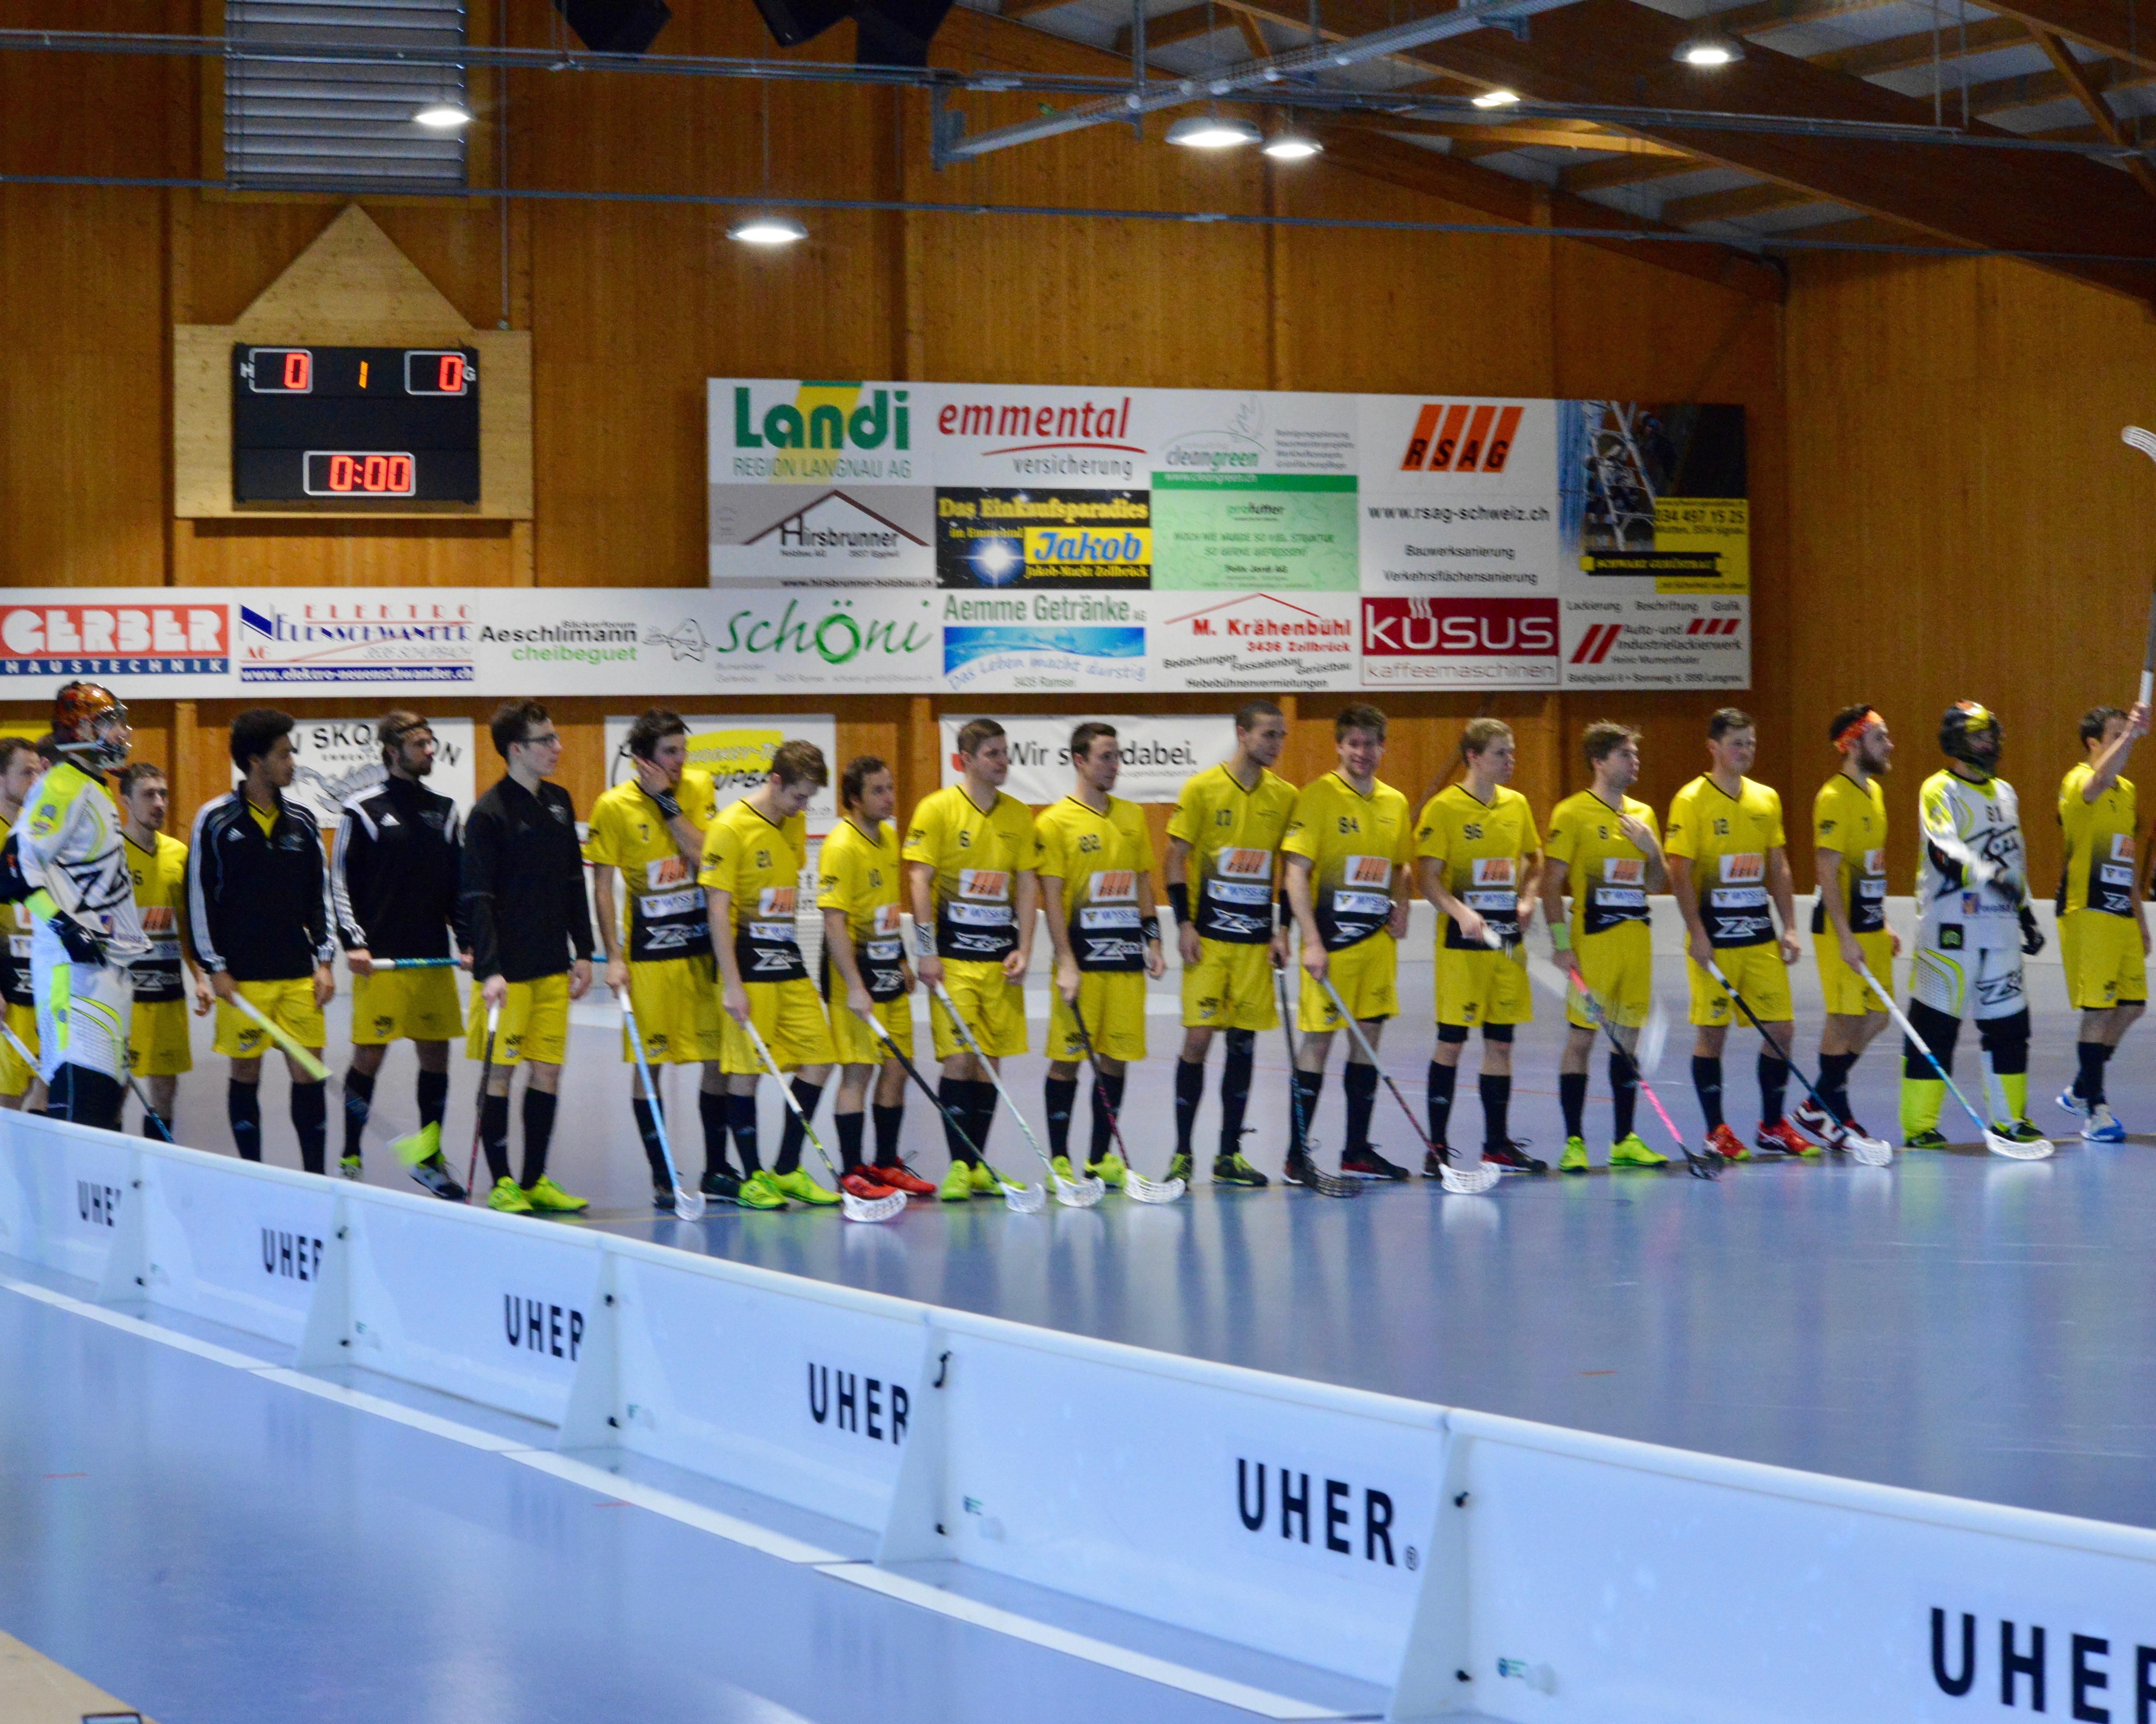 Herren I - UHC Eschenbach Saison 2016/17